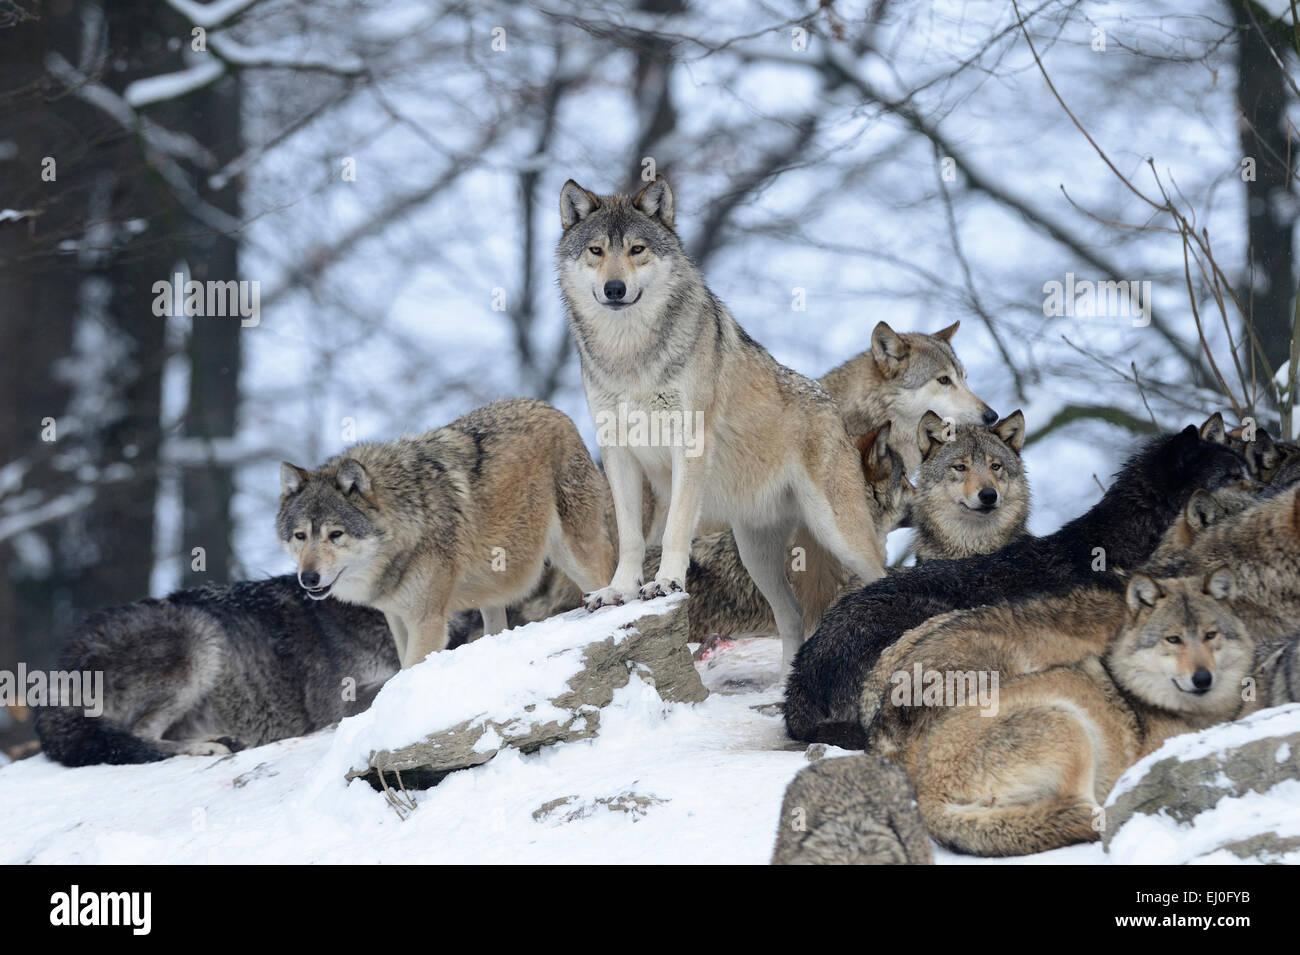 Wolf, animale predatore, lupi, predatori, lupo, canidi, Canis lupus lycaon, Germania, Europa Immagini Stock